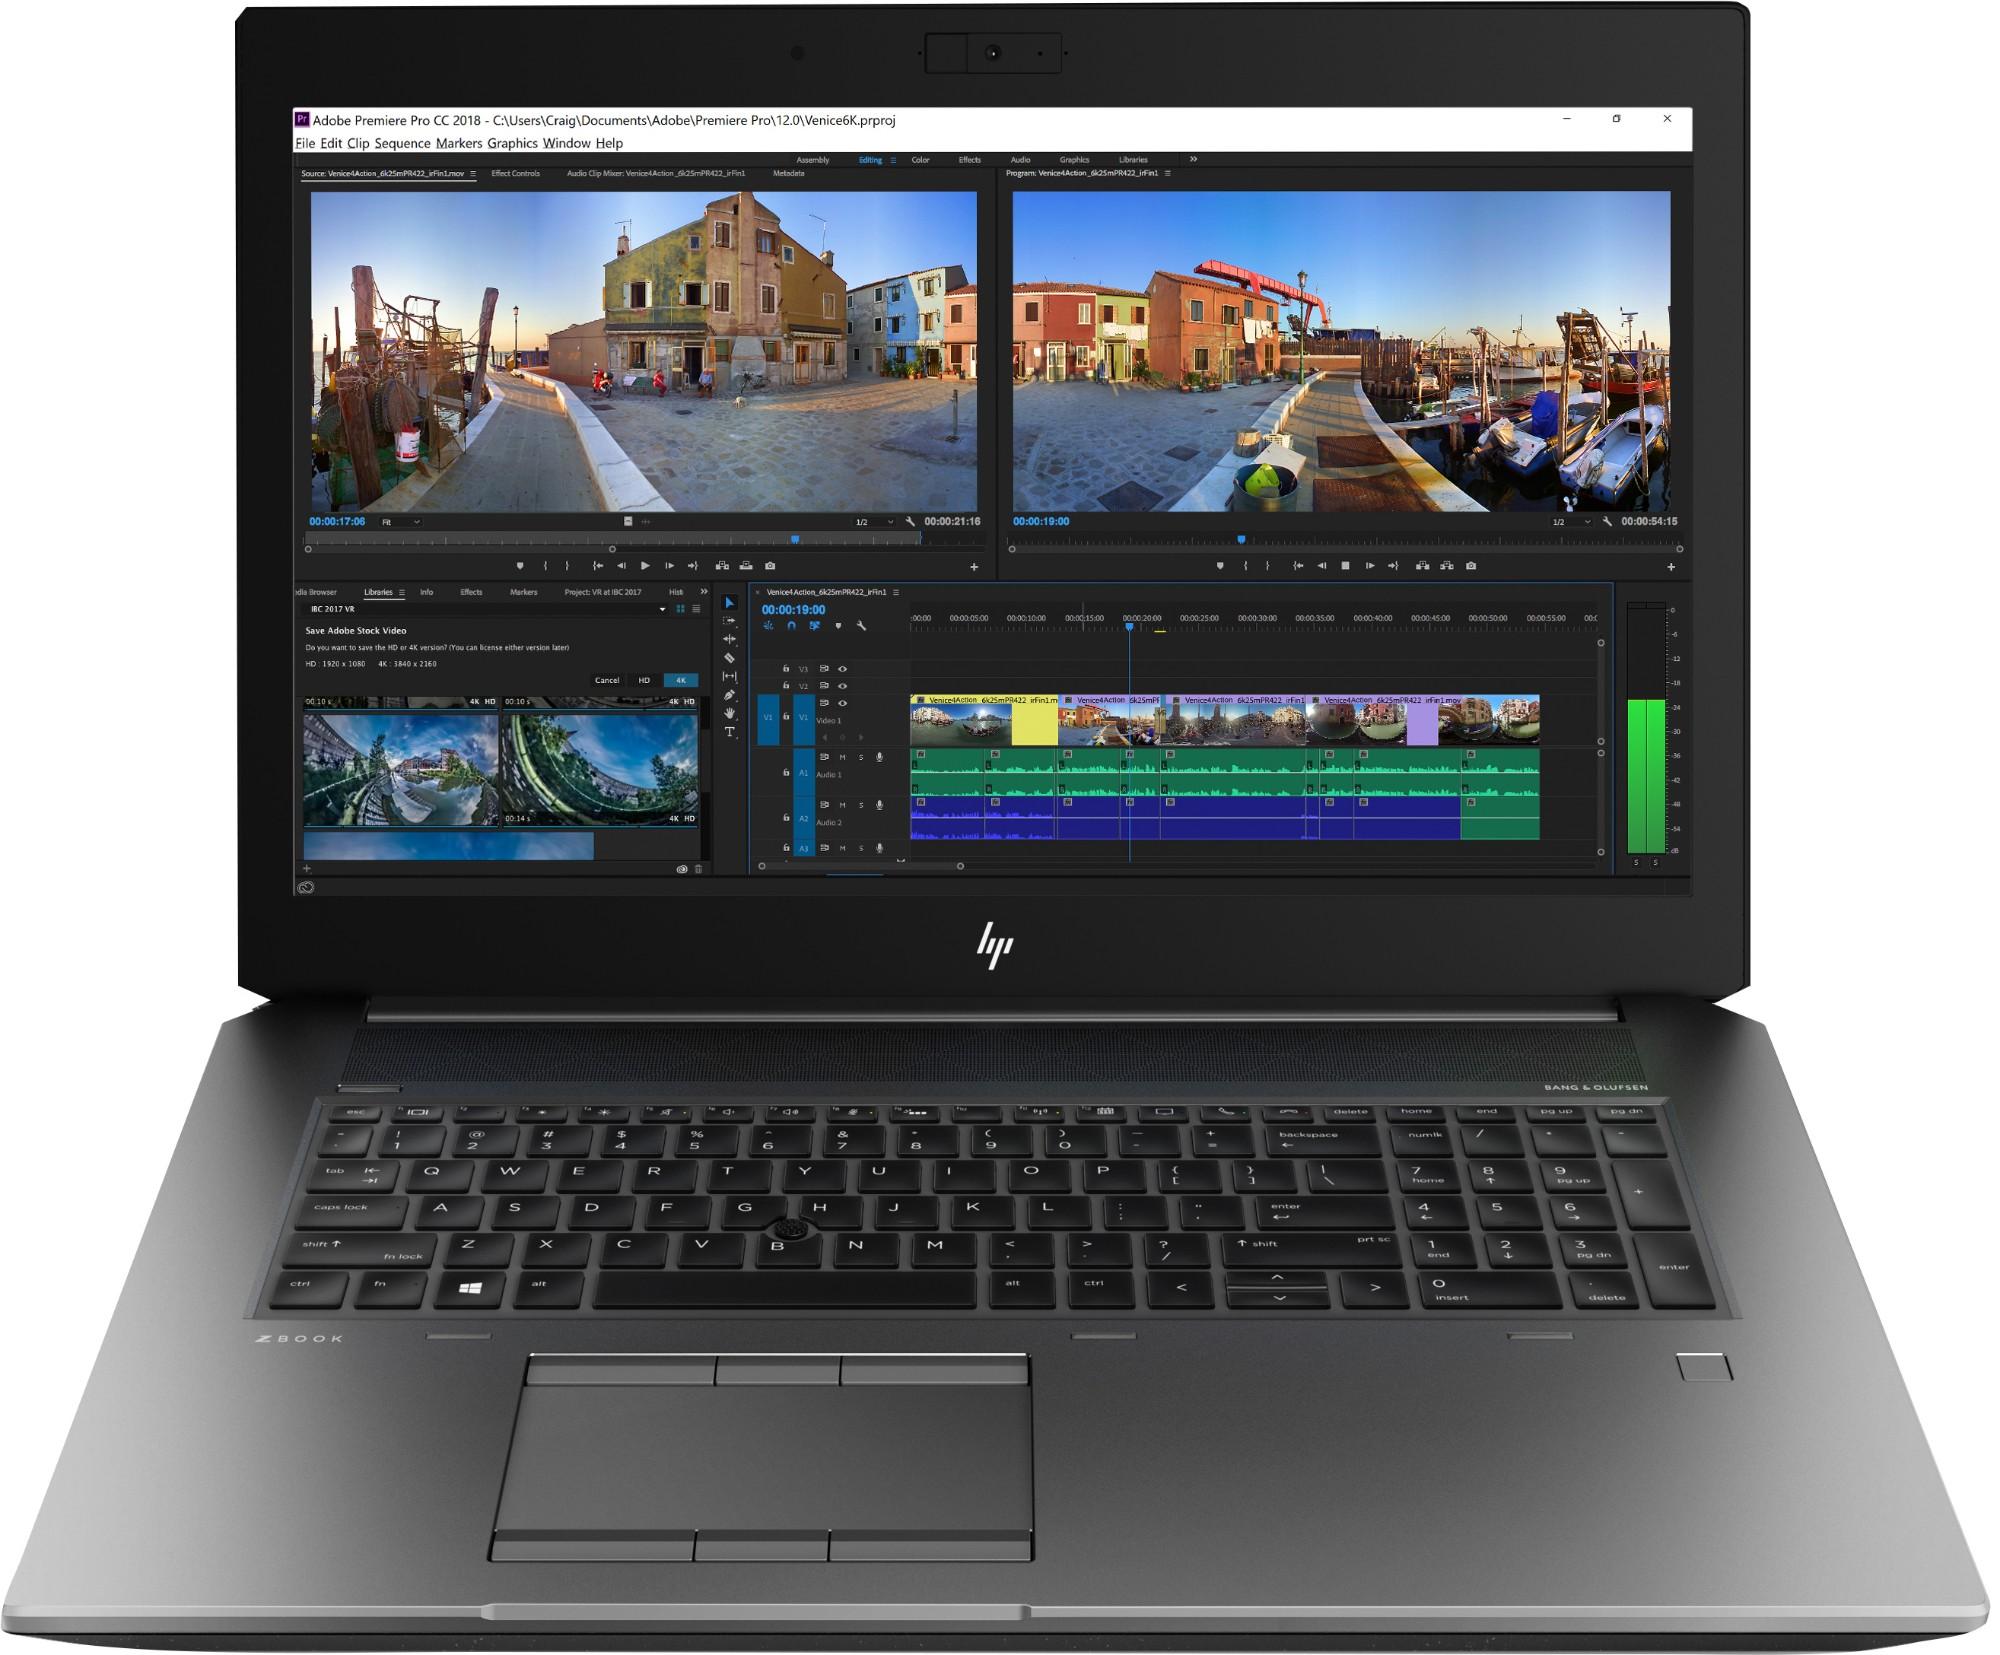 "HP ZBook 17 G5 Black,Silver Mobile workstation 43.9 cm (17.3"") 1920 x 1080 pixels Intel® Xeon® 32 GB DDR4-SDRAM 512 GB SSD Windows 10 Pro for Workstations"